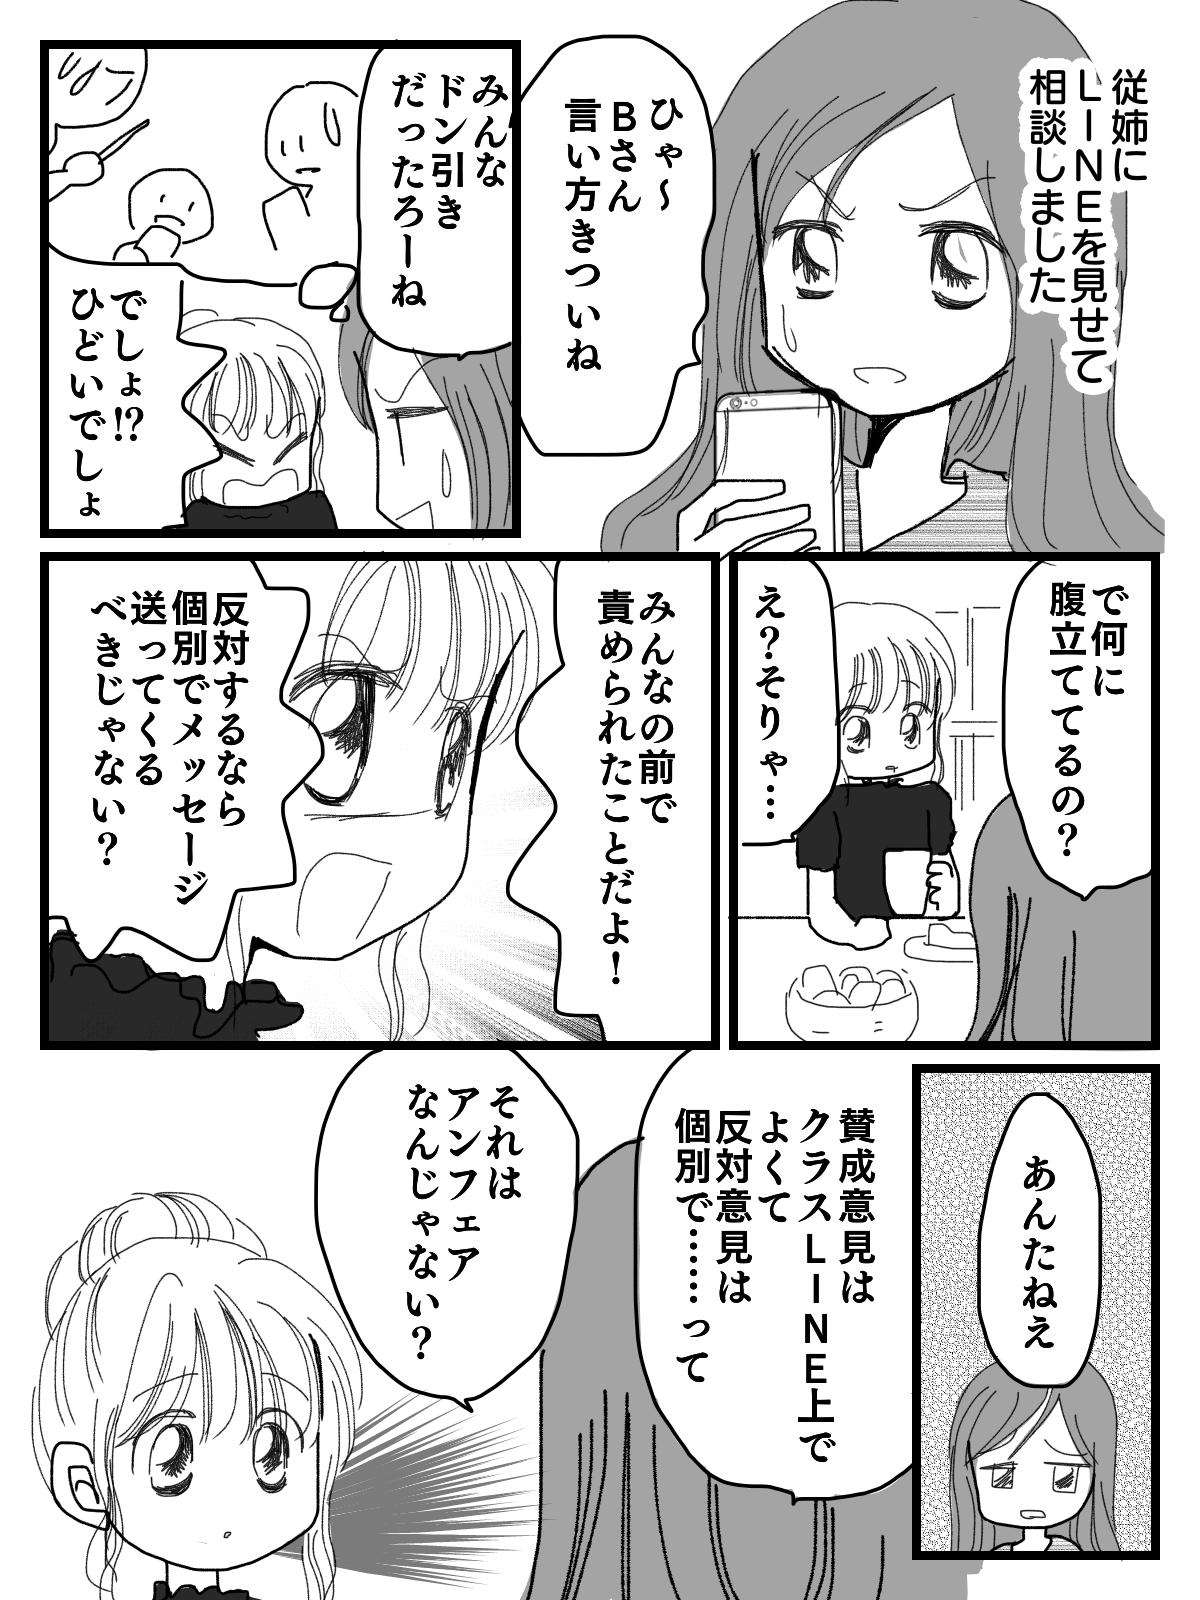 2-1 (1)